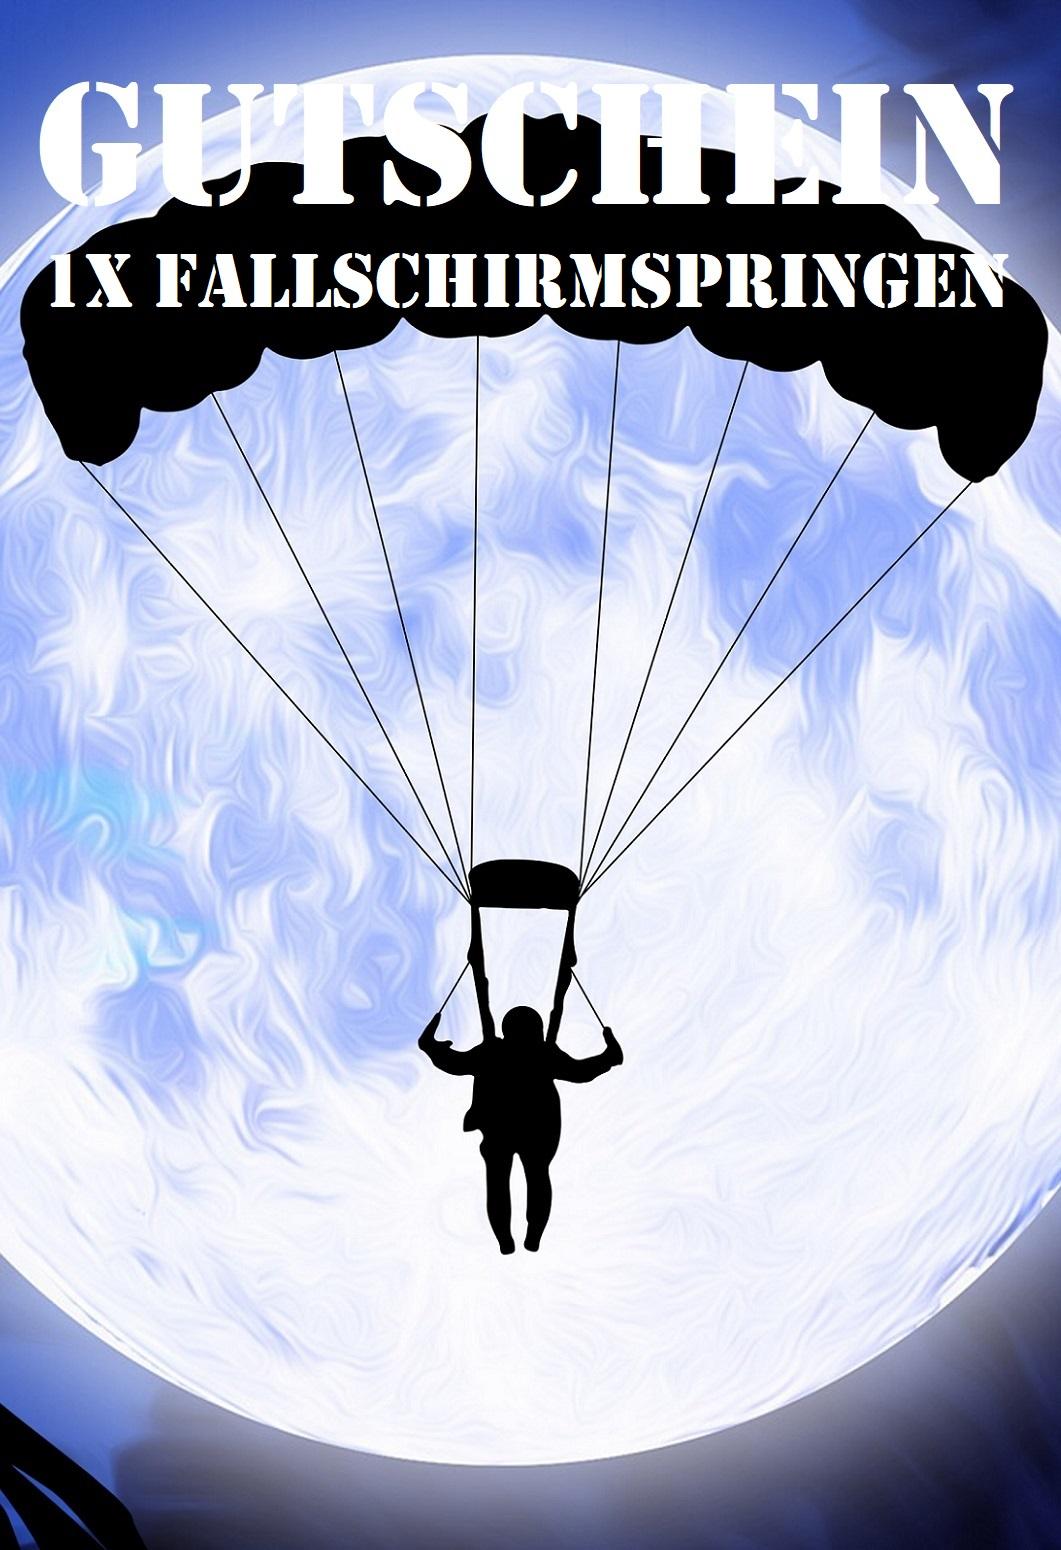 Tandemsprung Mit Dem Fallschirm 4